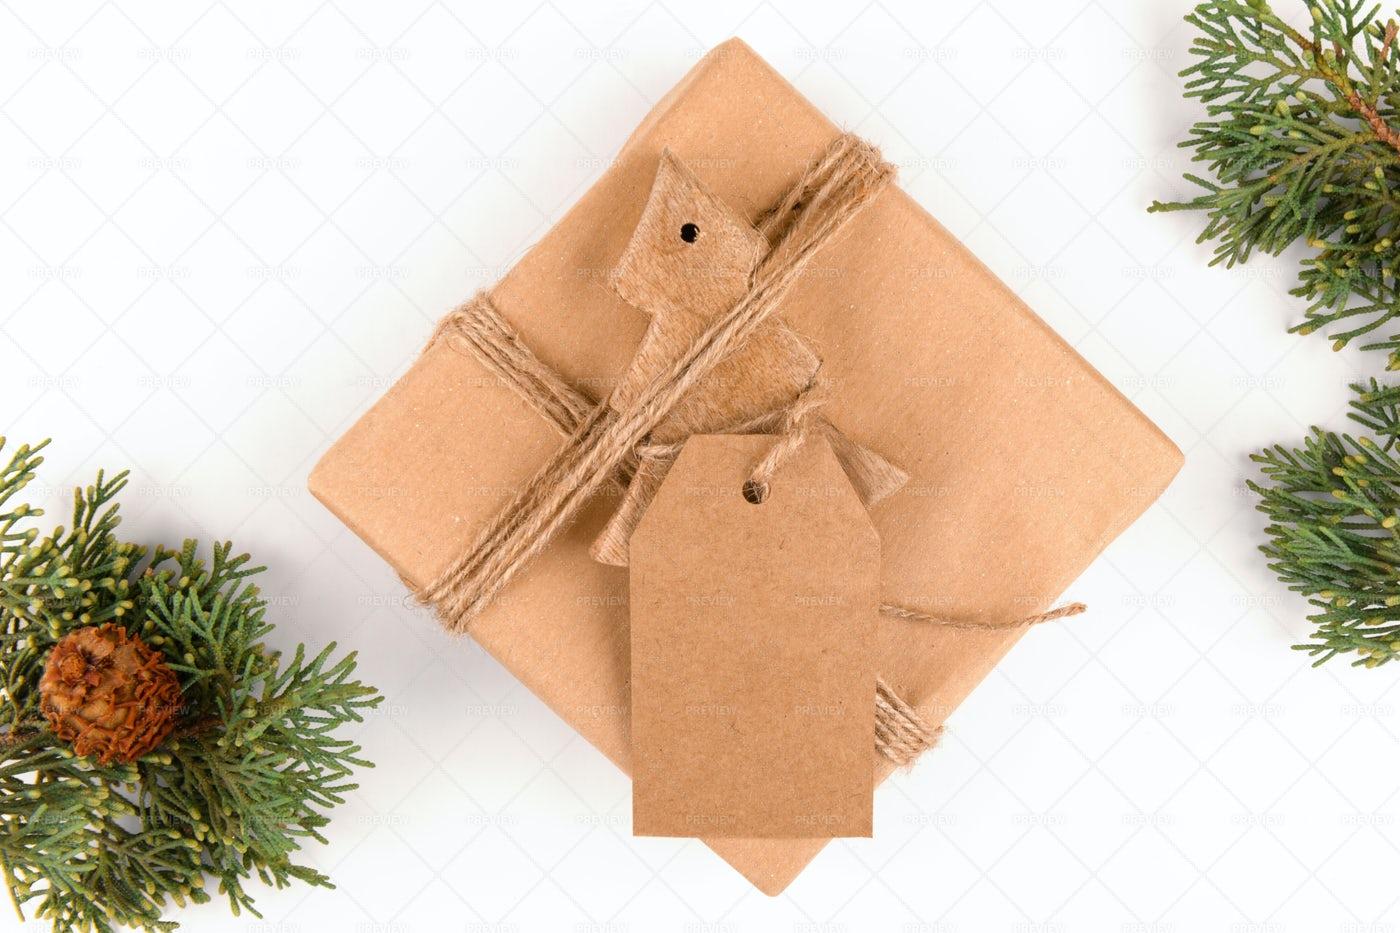 Christmas Gift Flat Lay: Stock Photos